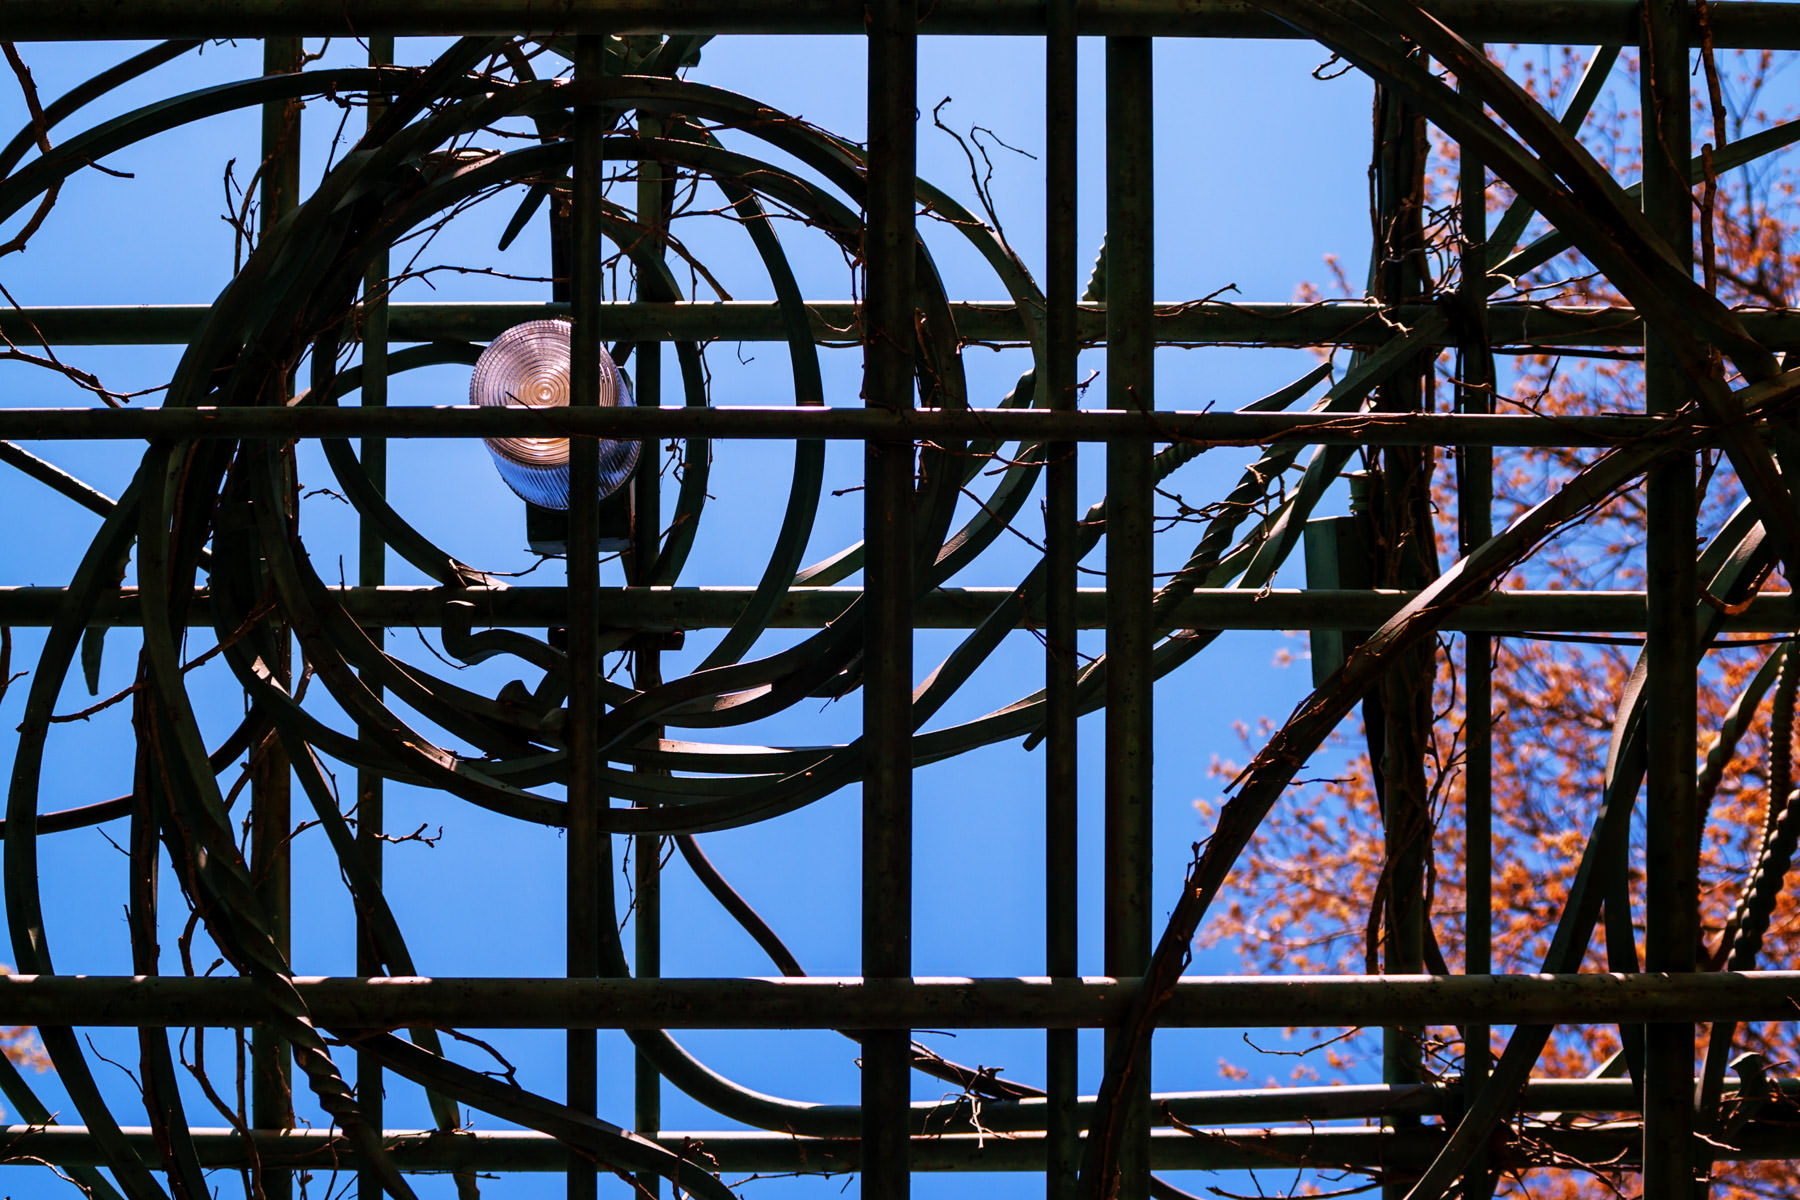 Grape vines and a solitary light atop a lattice at the Dallas Arboretum.